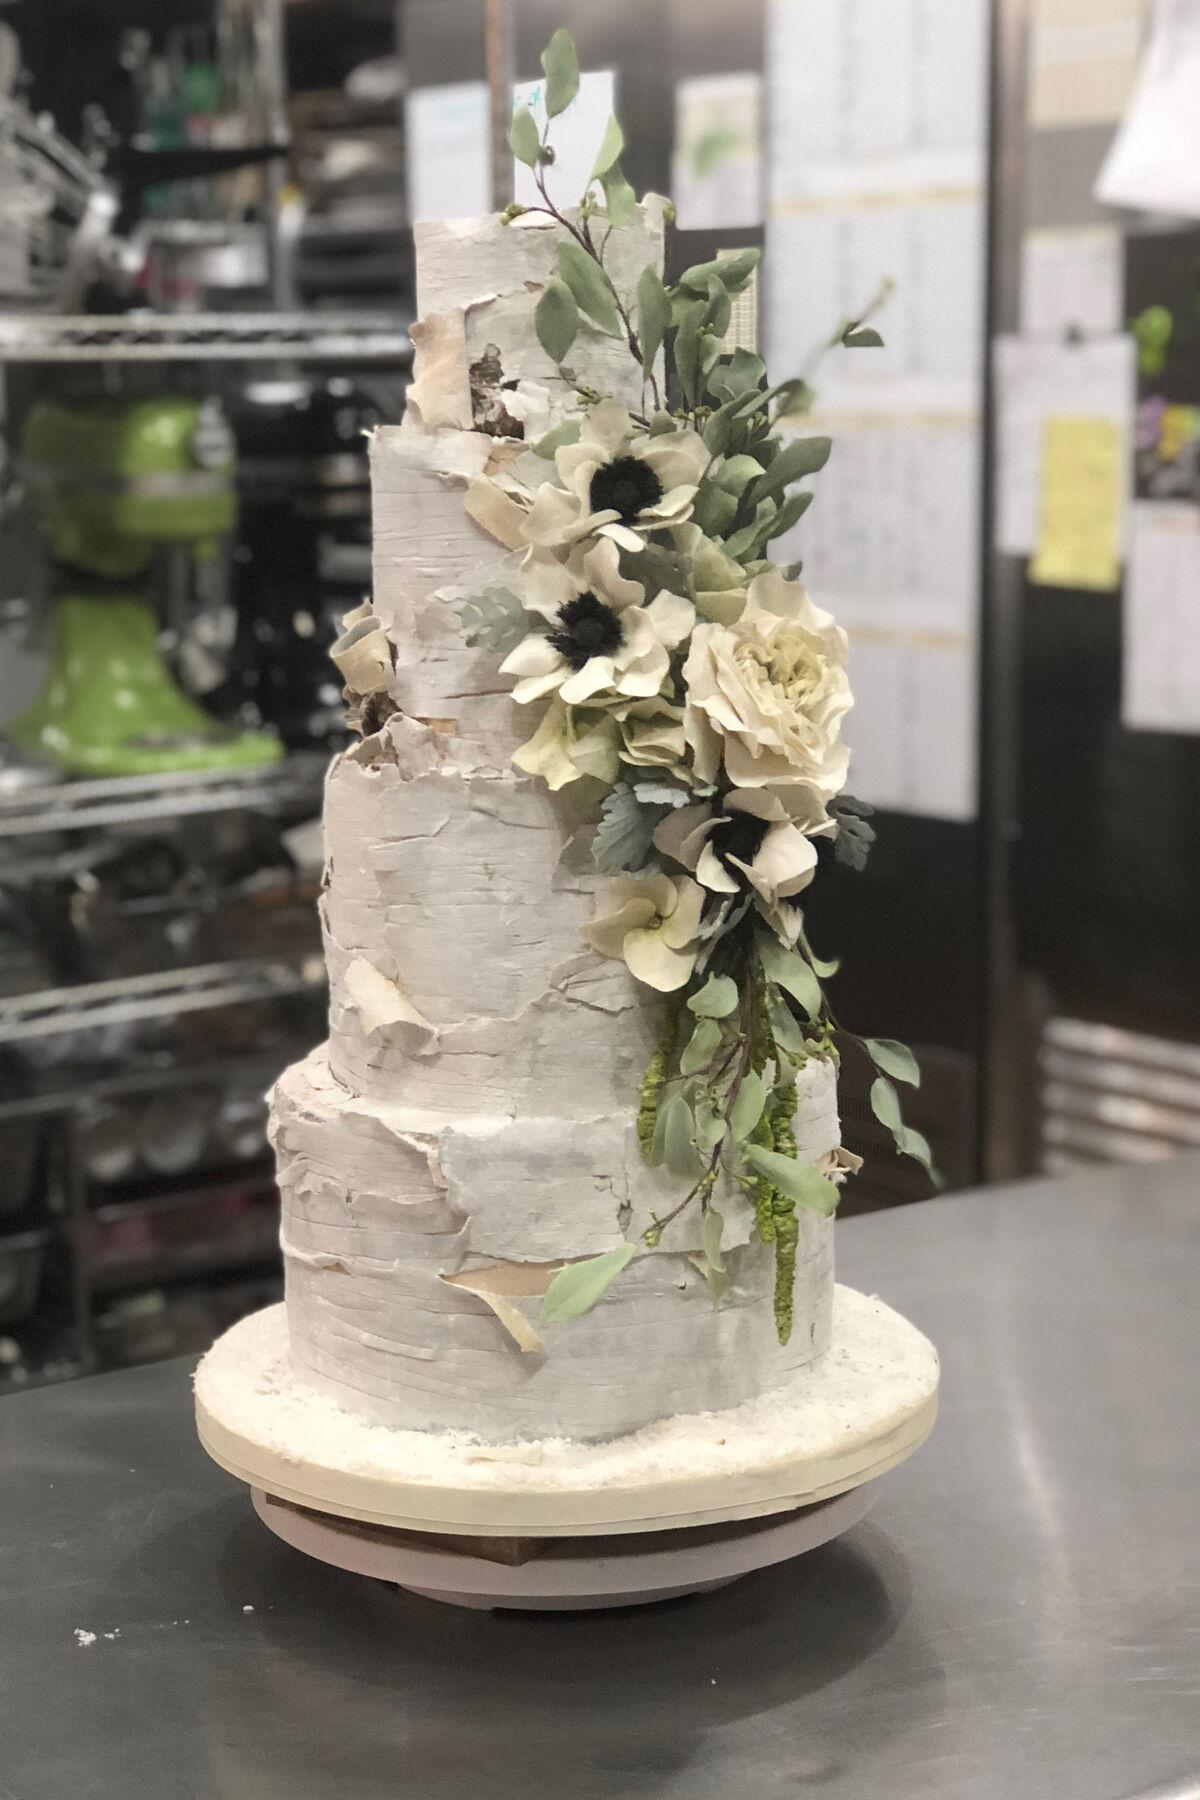 Birch tree wedding cake by Madison Lee's Cakes. Courtesy of Madison Lee's Cakes.